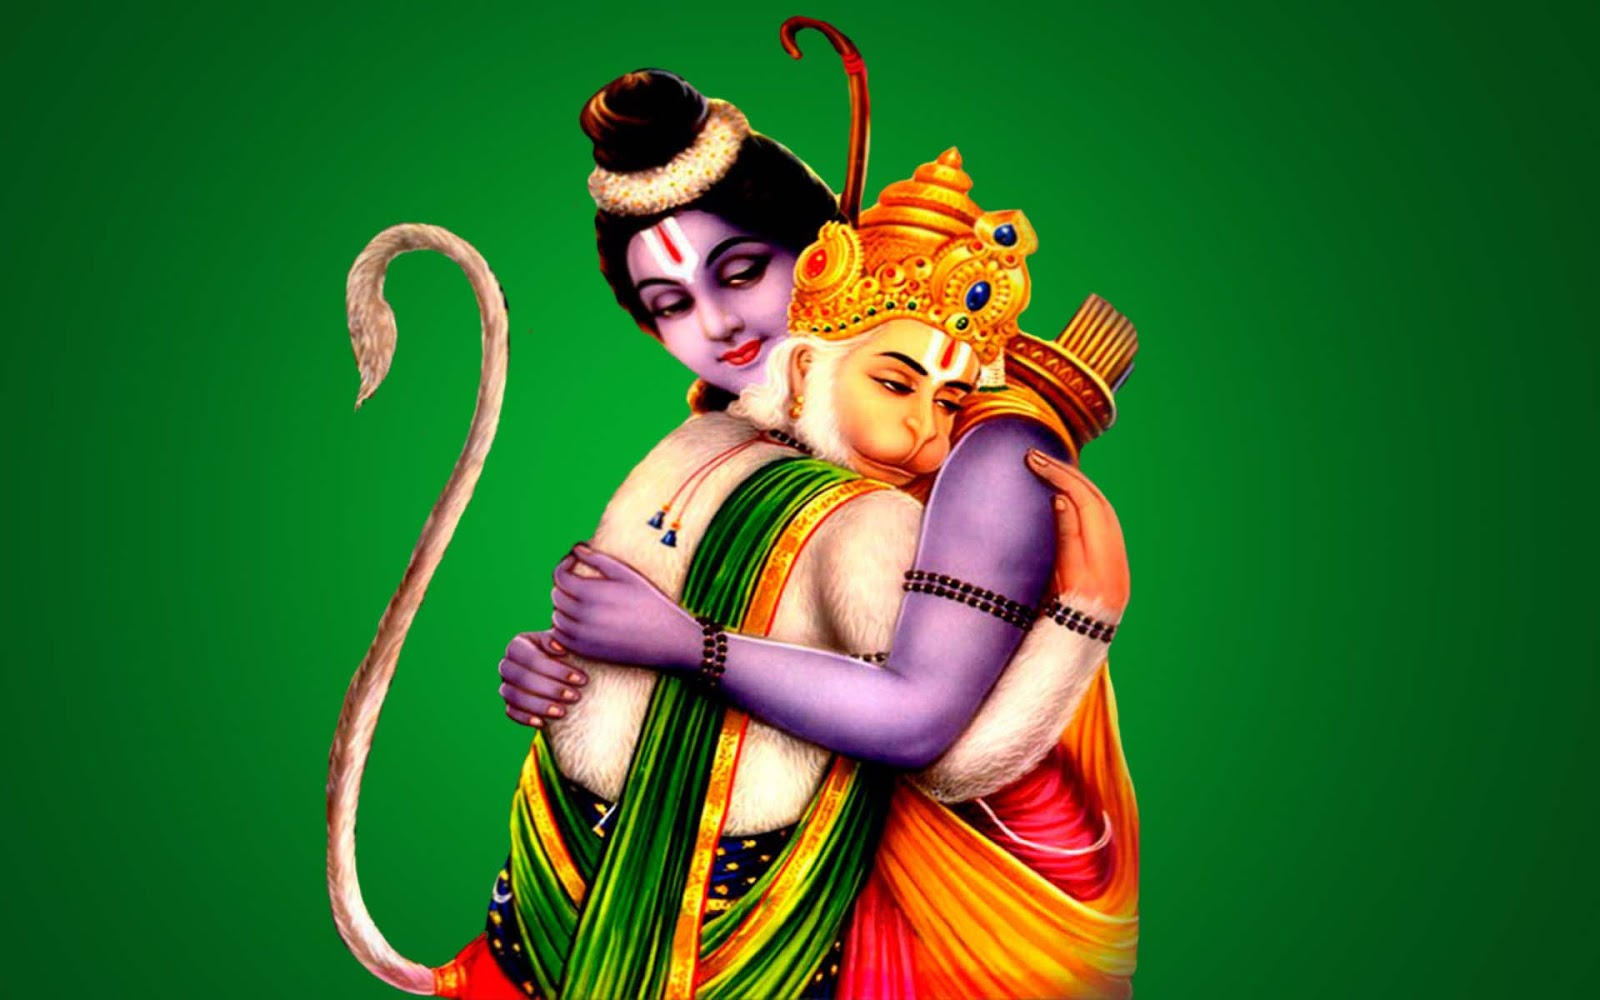 Hd wallpaper jai shri ram - Bhakta Hanuman Hug With Shree Ram Walls Images